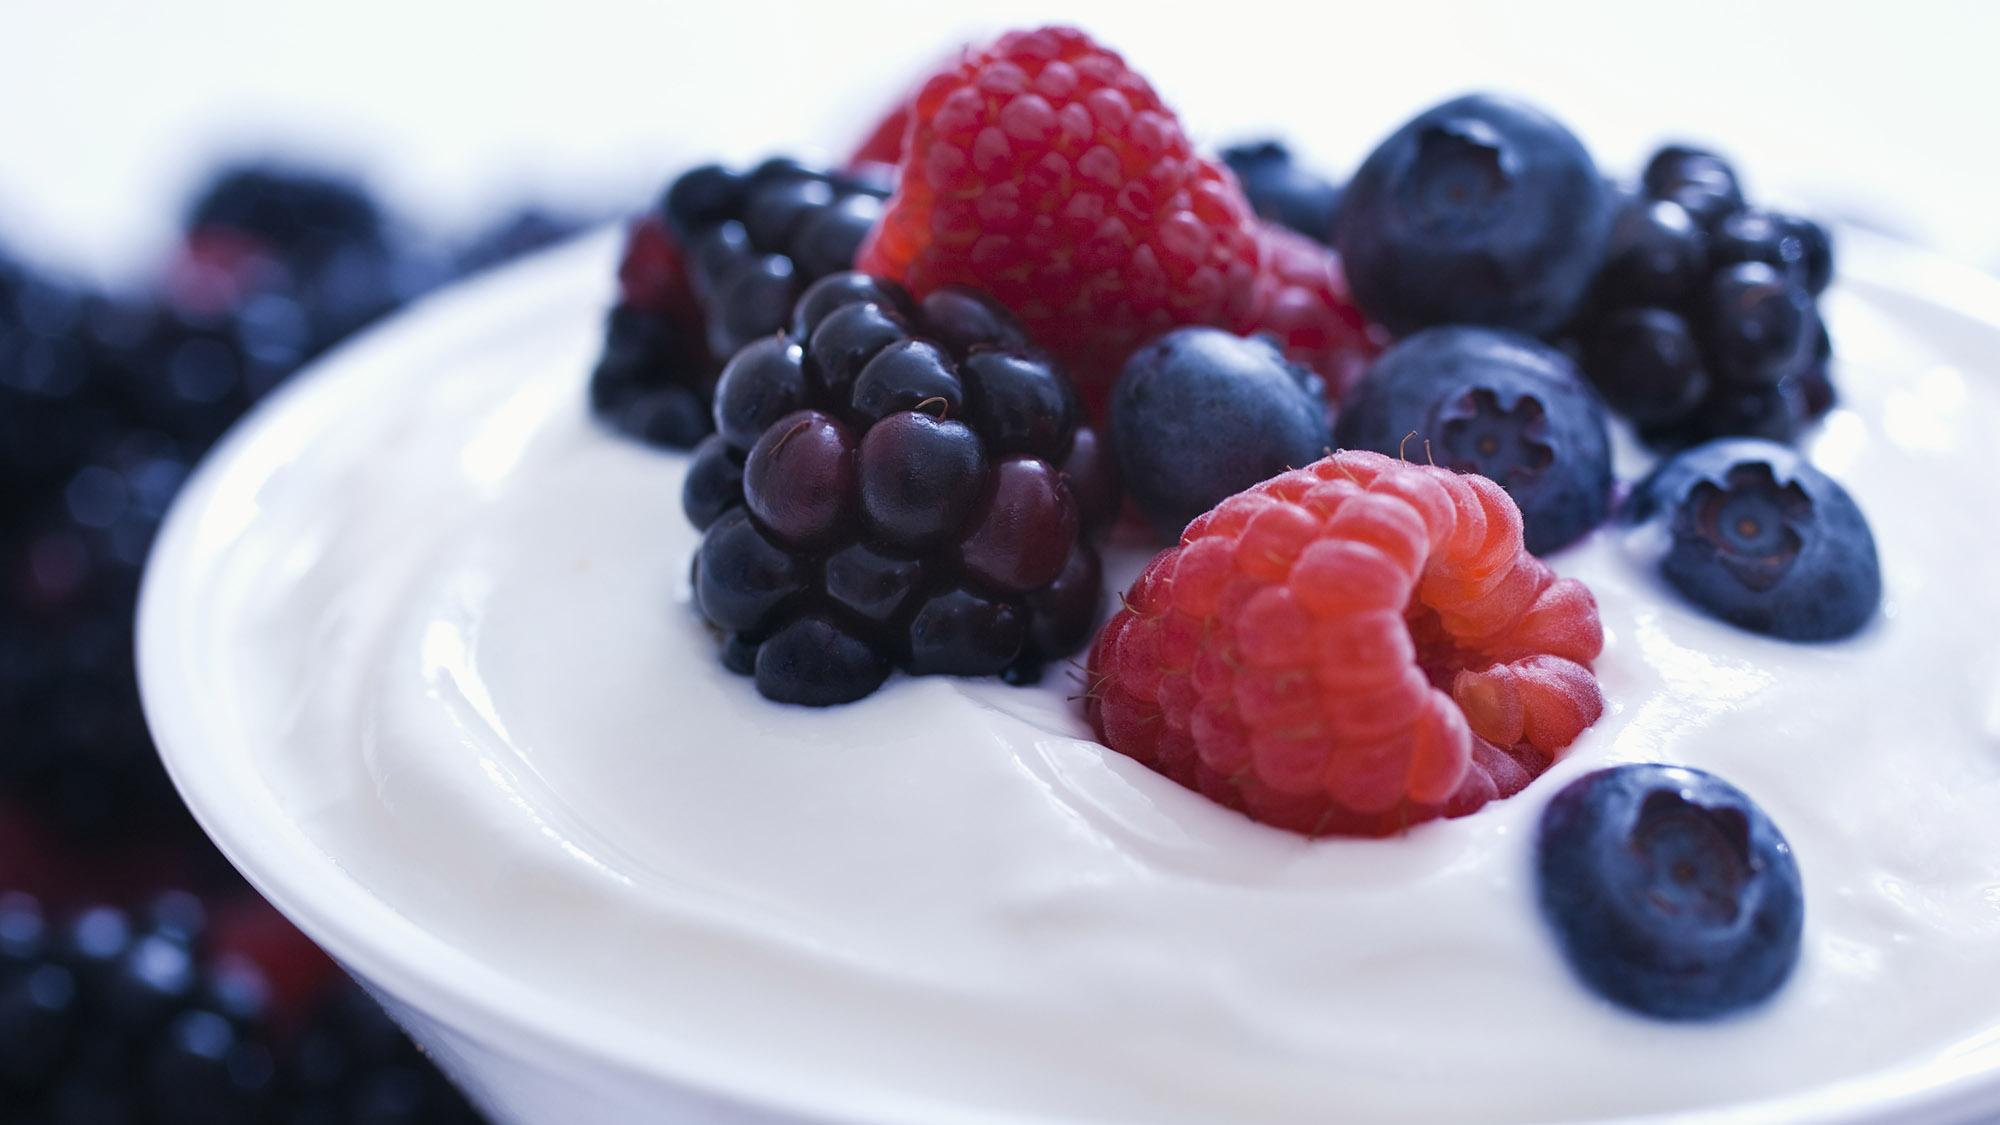 Yoghurt bowl with fruit